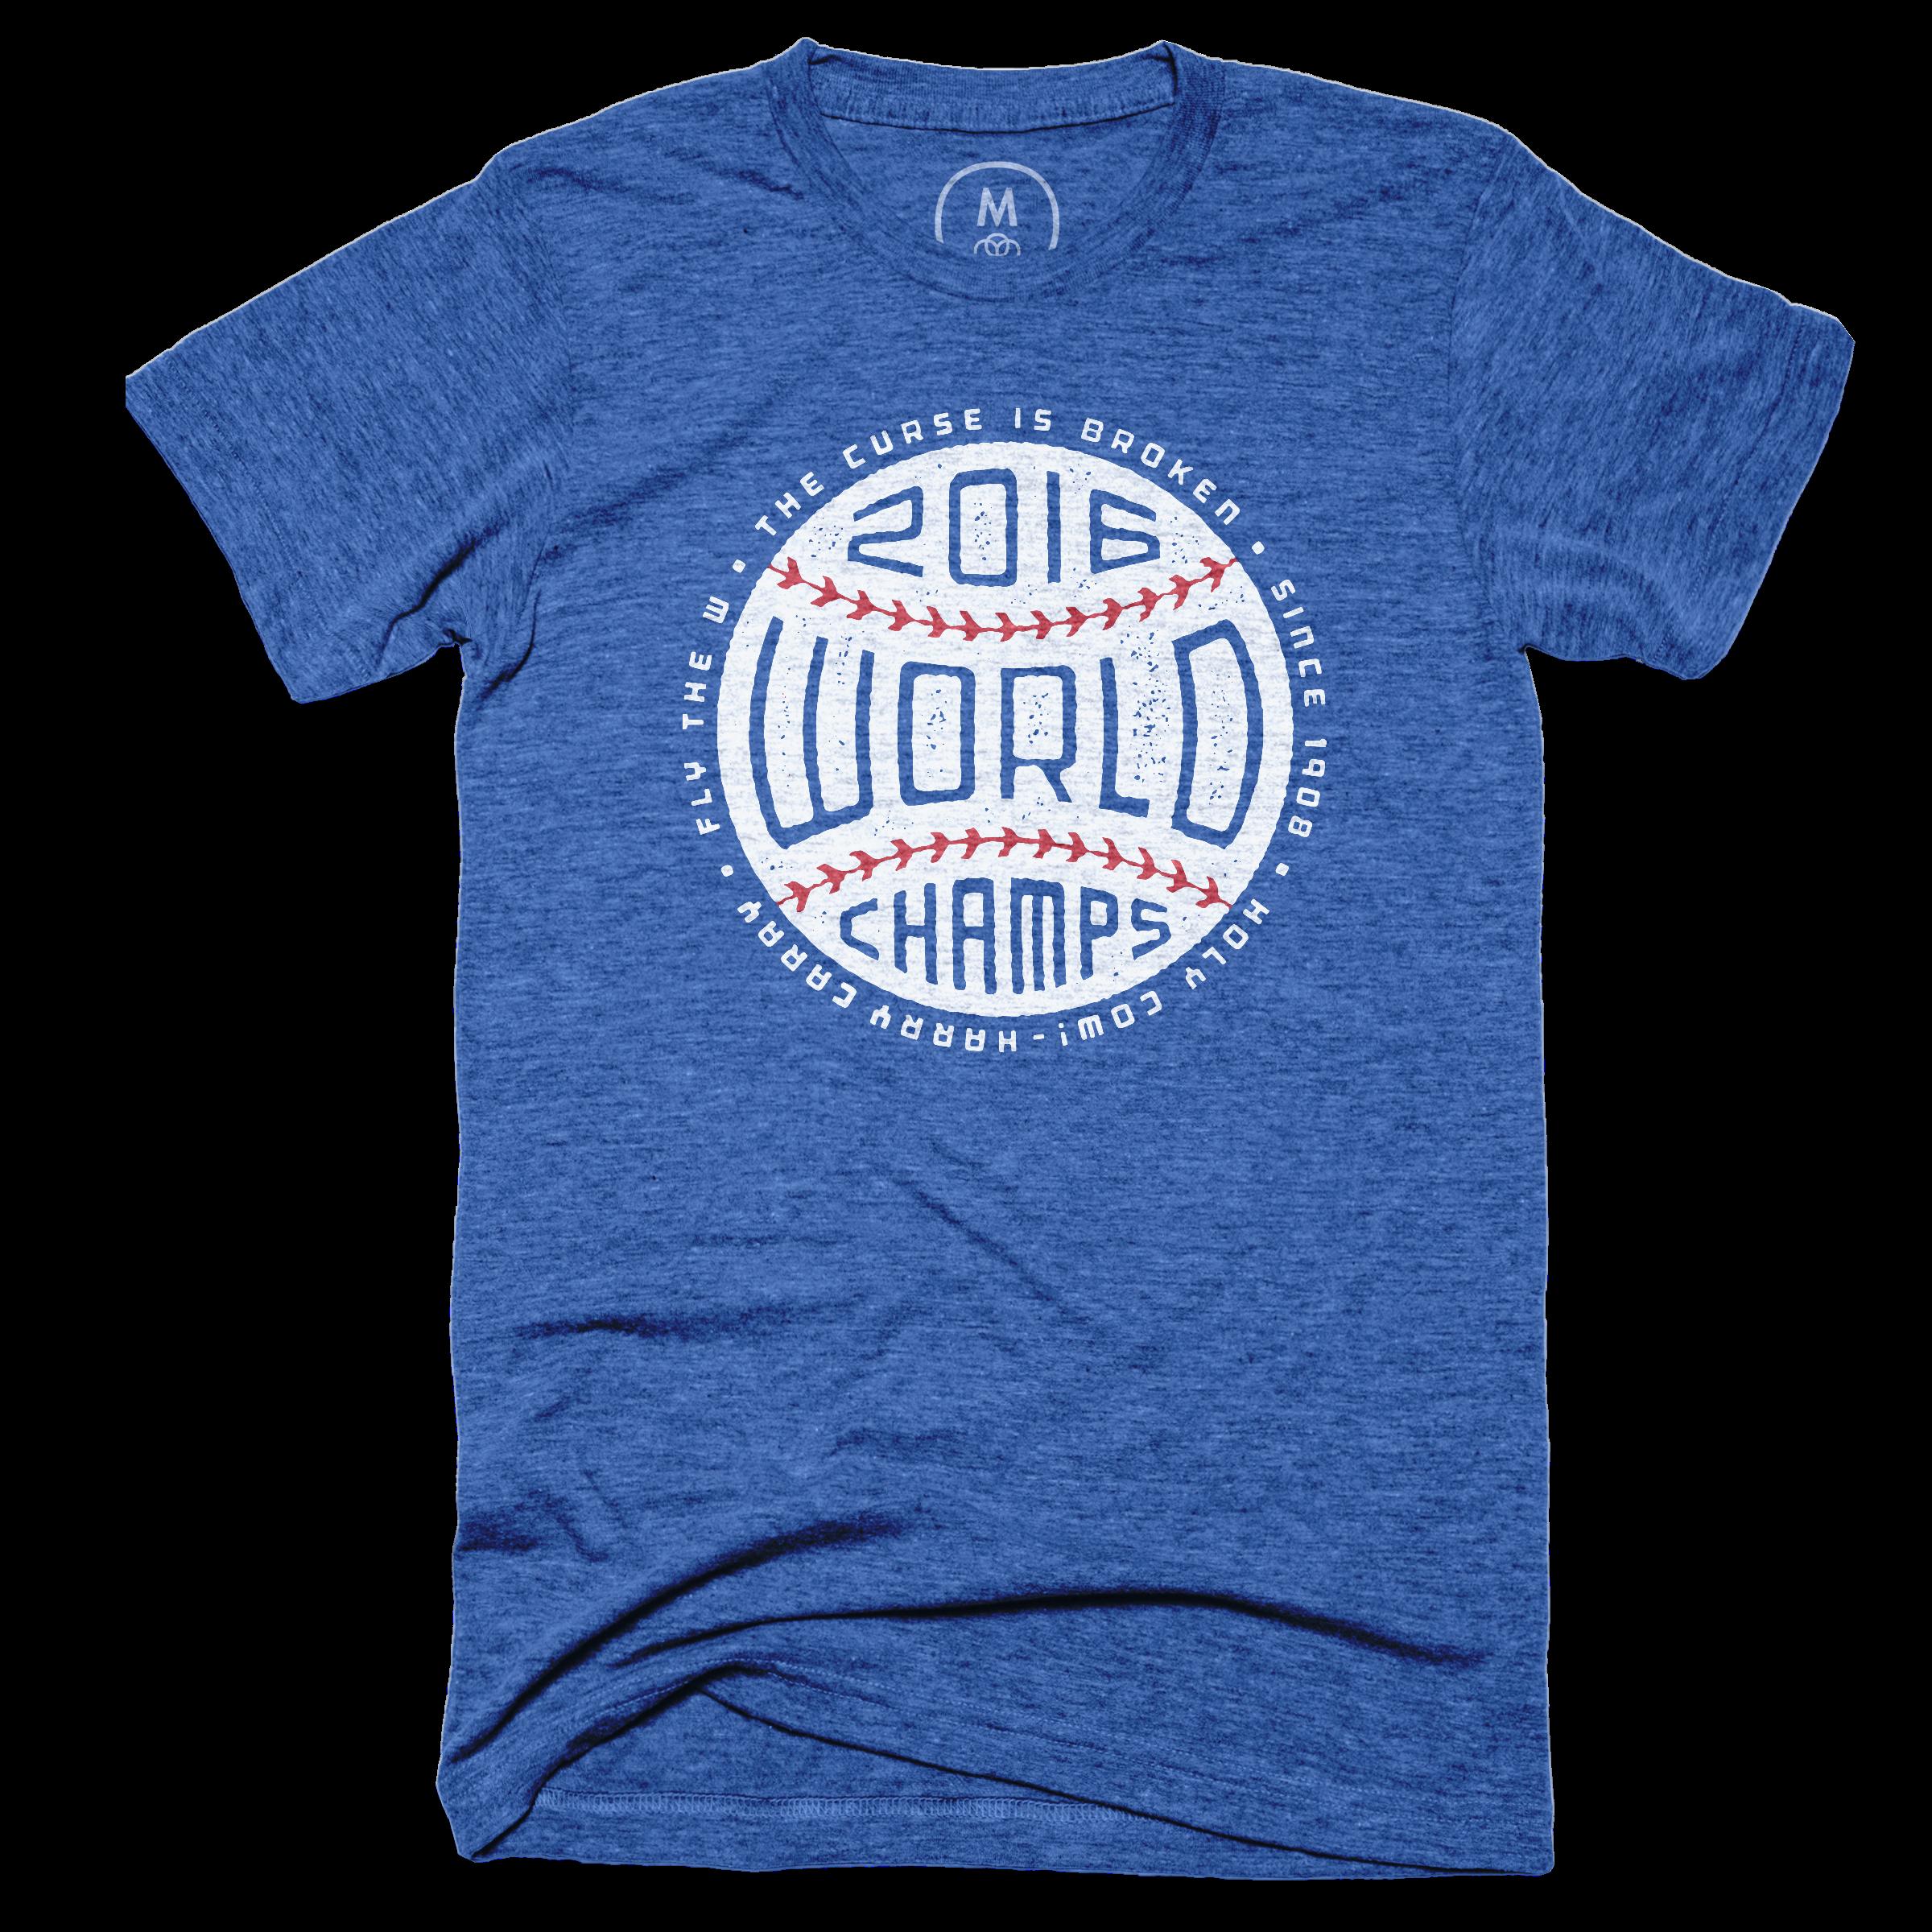 2016 World Champs!